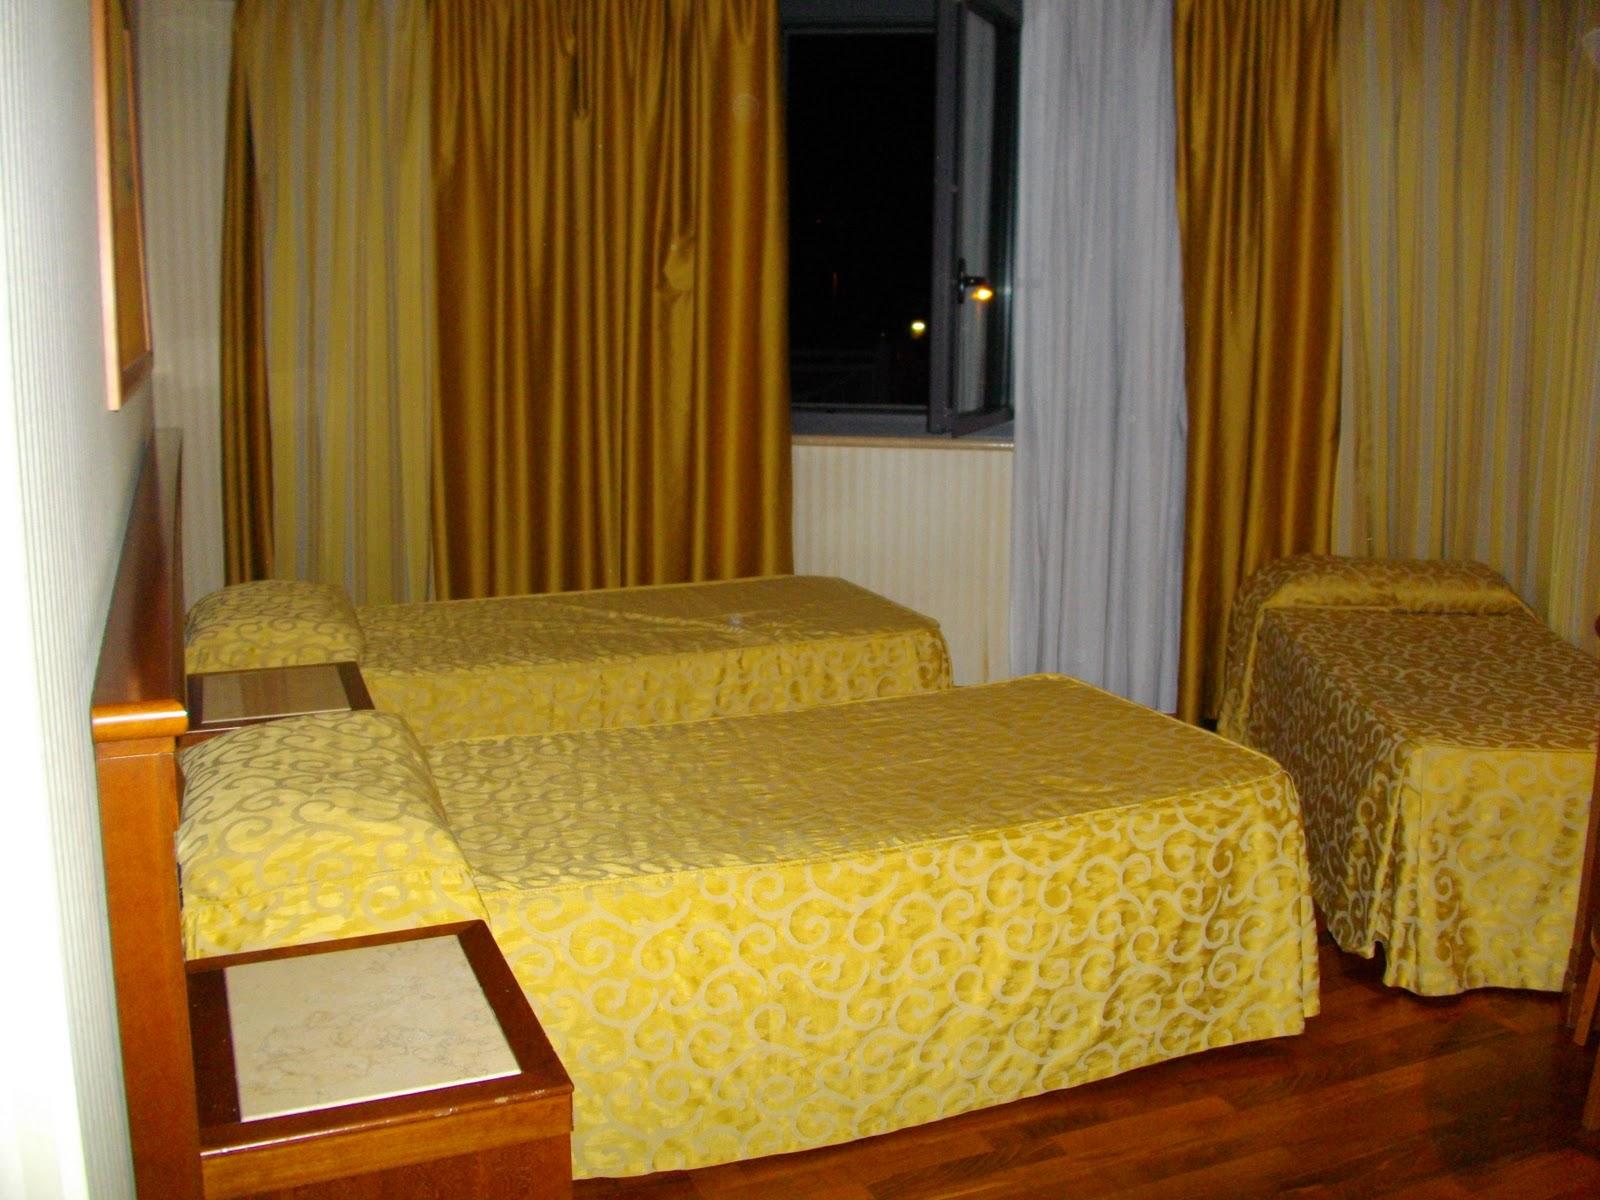 Hotel roma siracusa in siracusa for Hotel roma siracusa